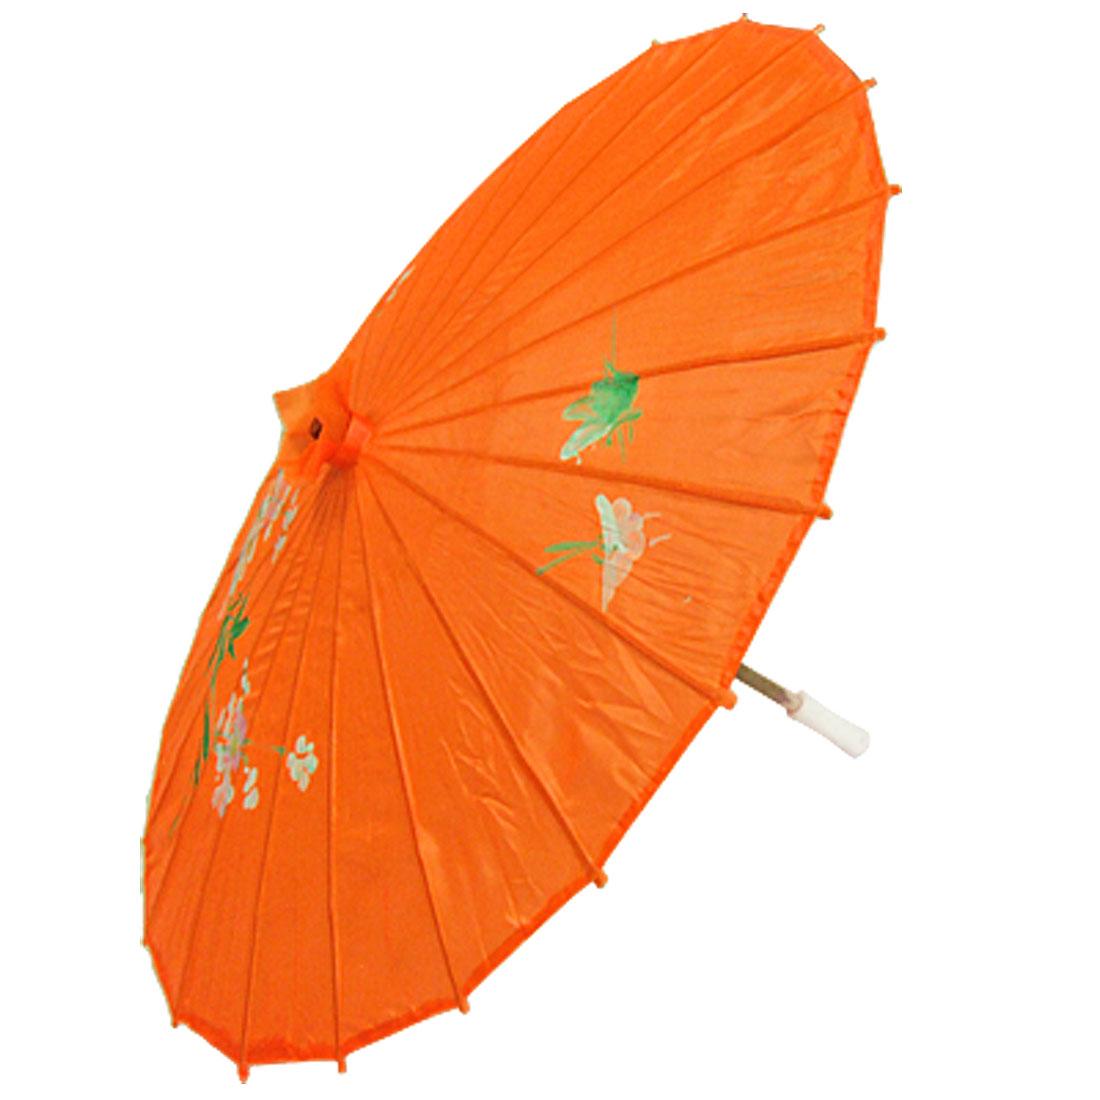 Blossom Print Orange Red Bamboo Folding Dancing Parasol Umbrella